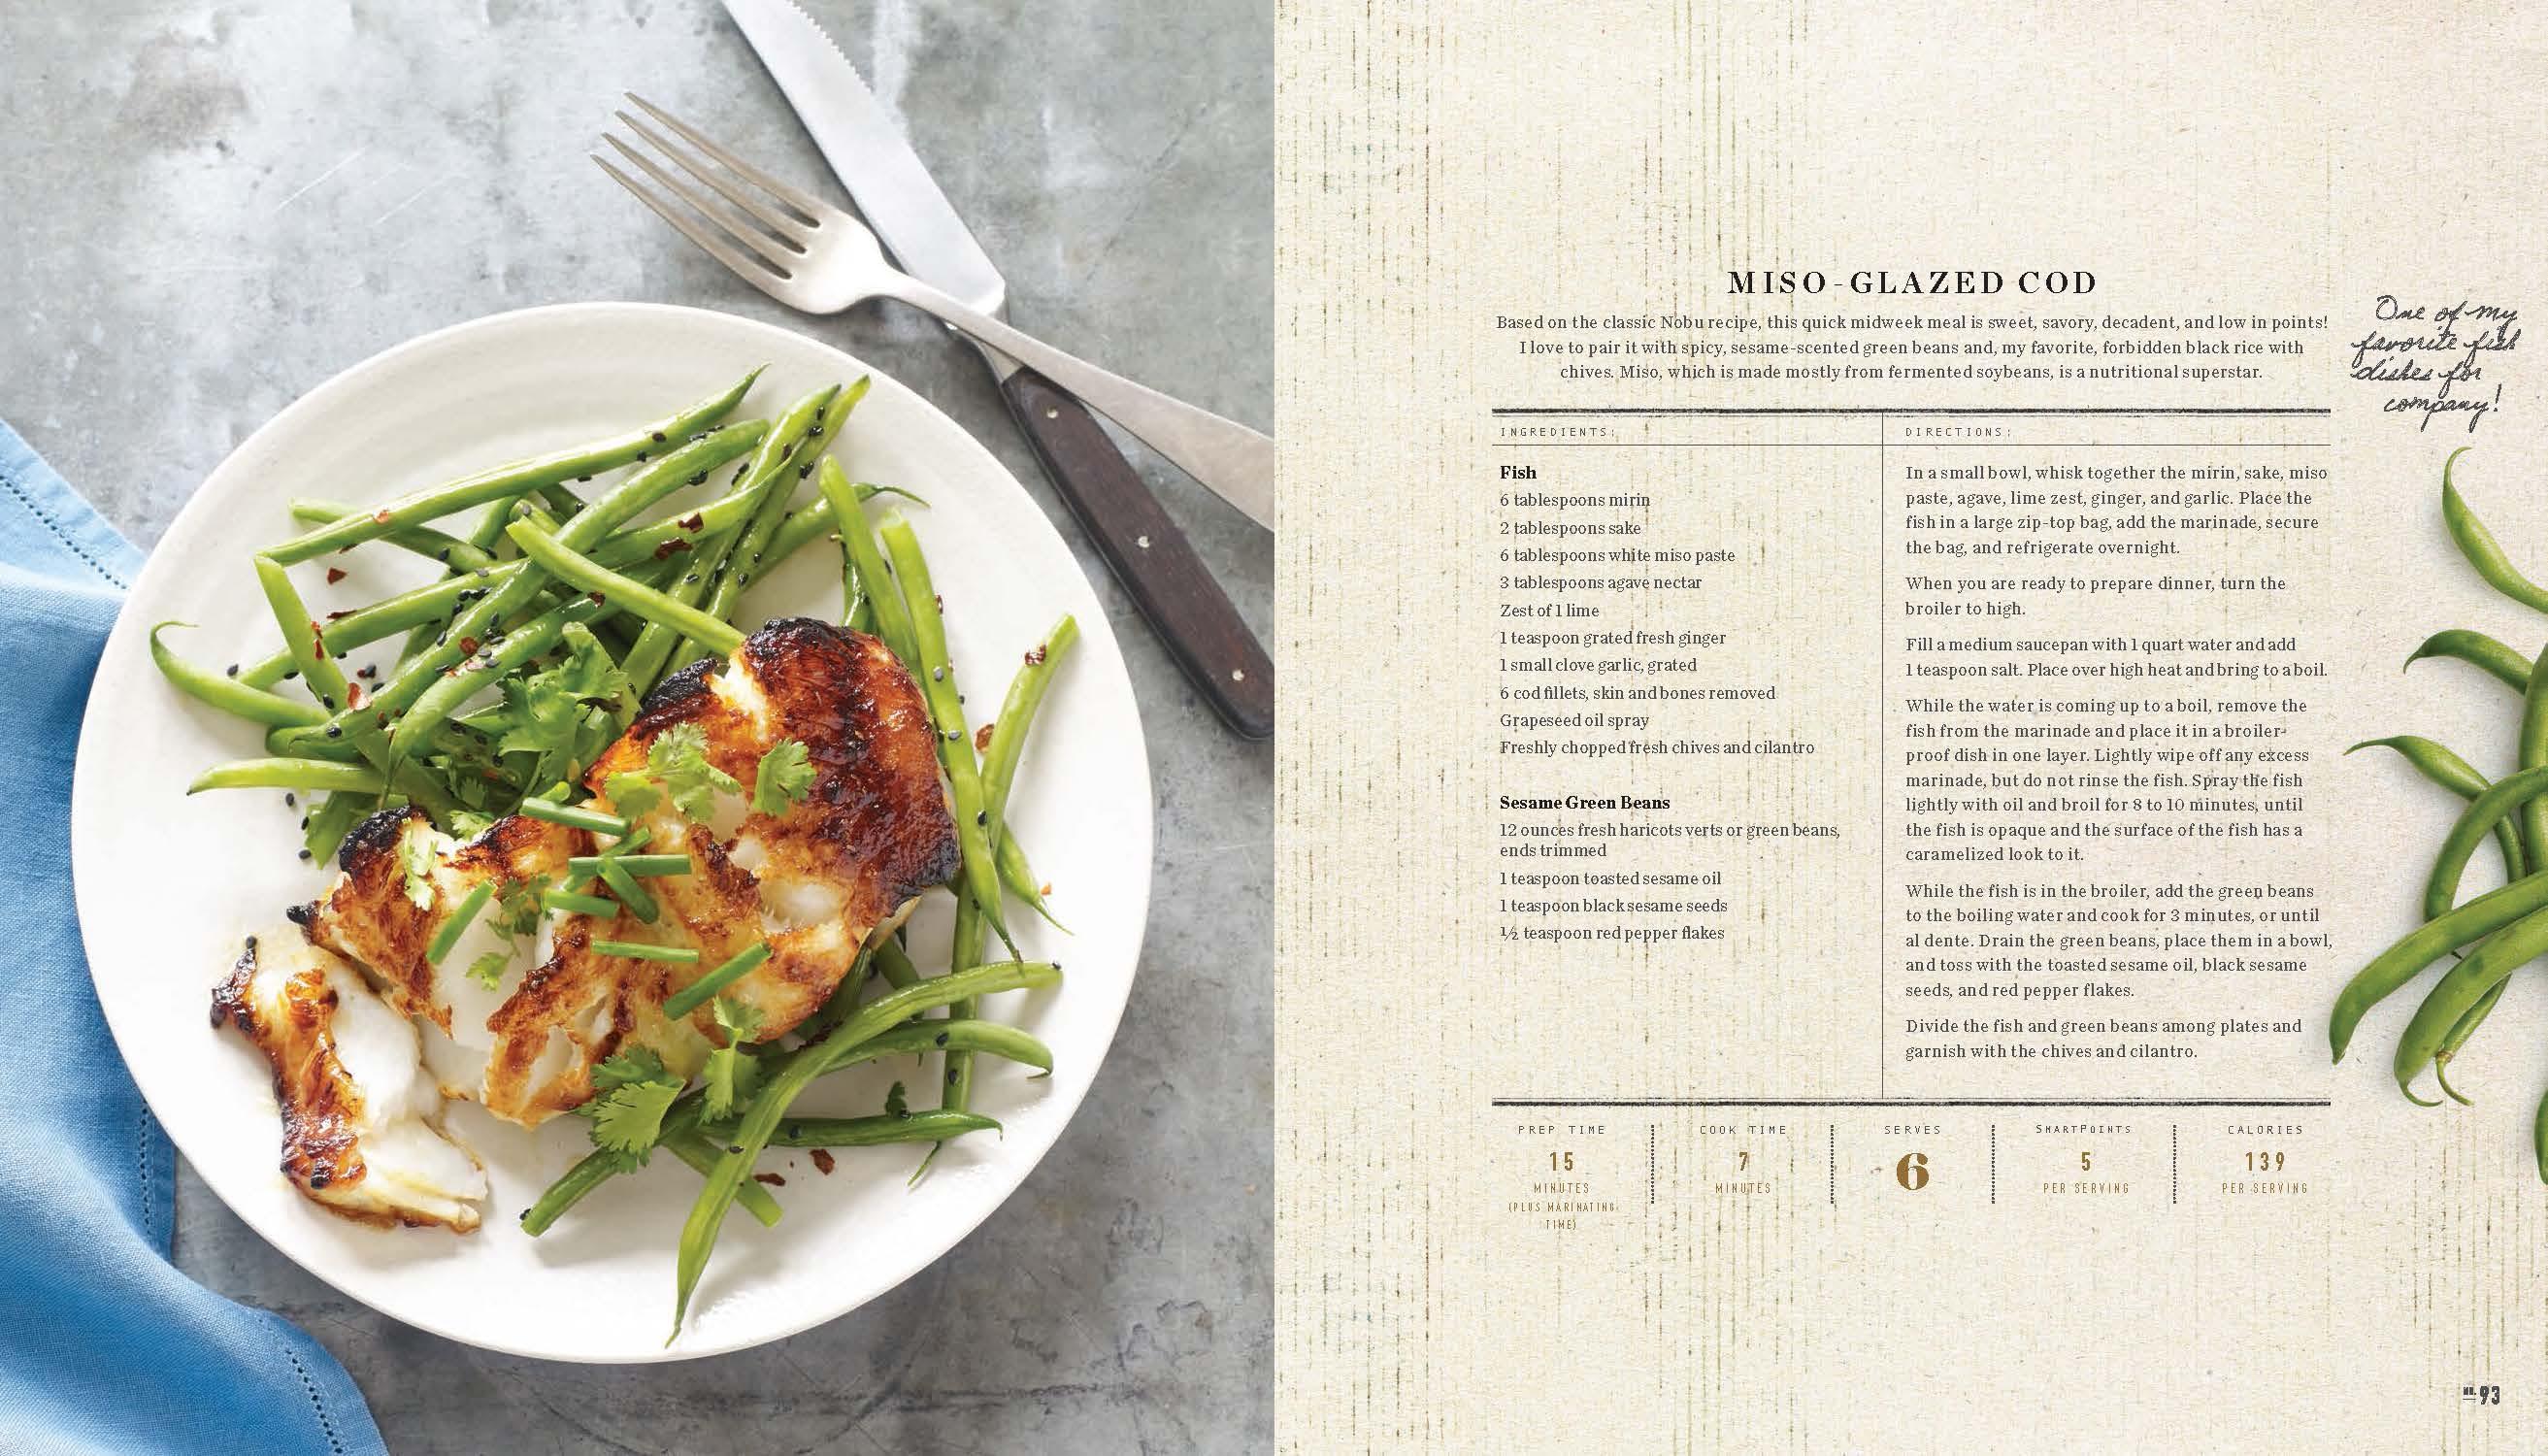 Oprahs first cookbook has arrived eater oprahs first cookbook has arrived forumfinder Image collections